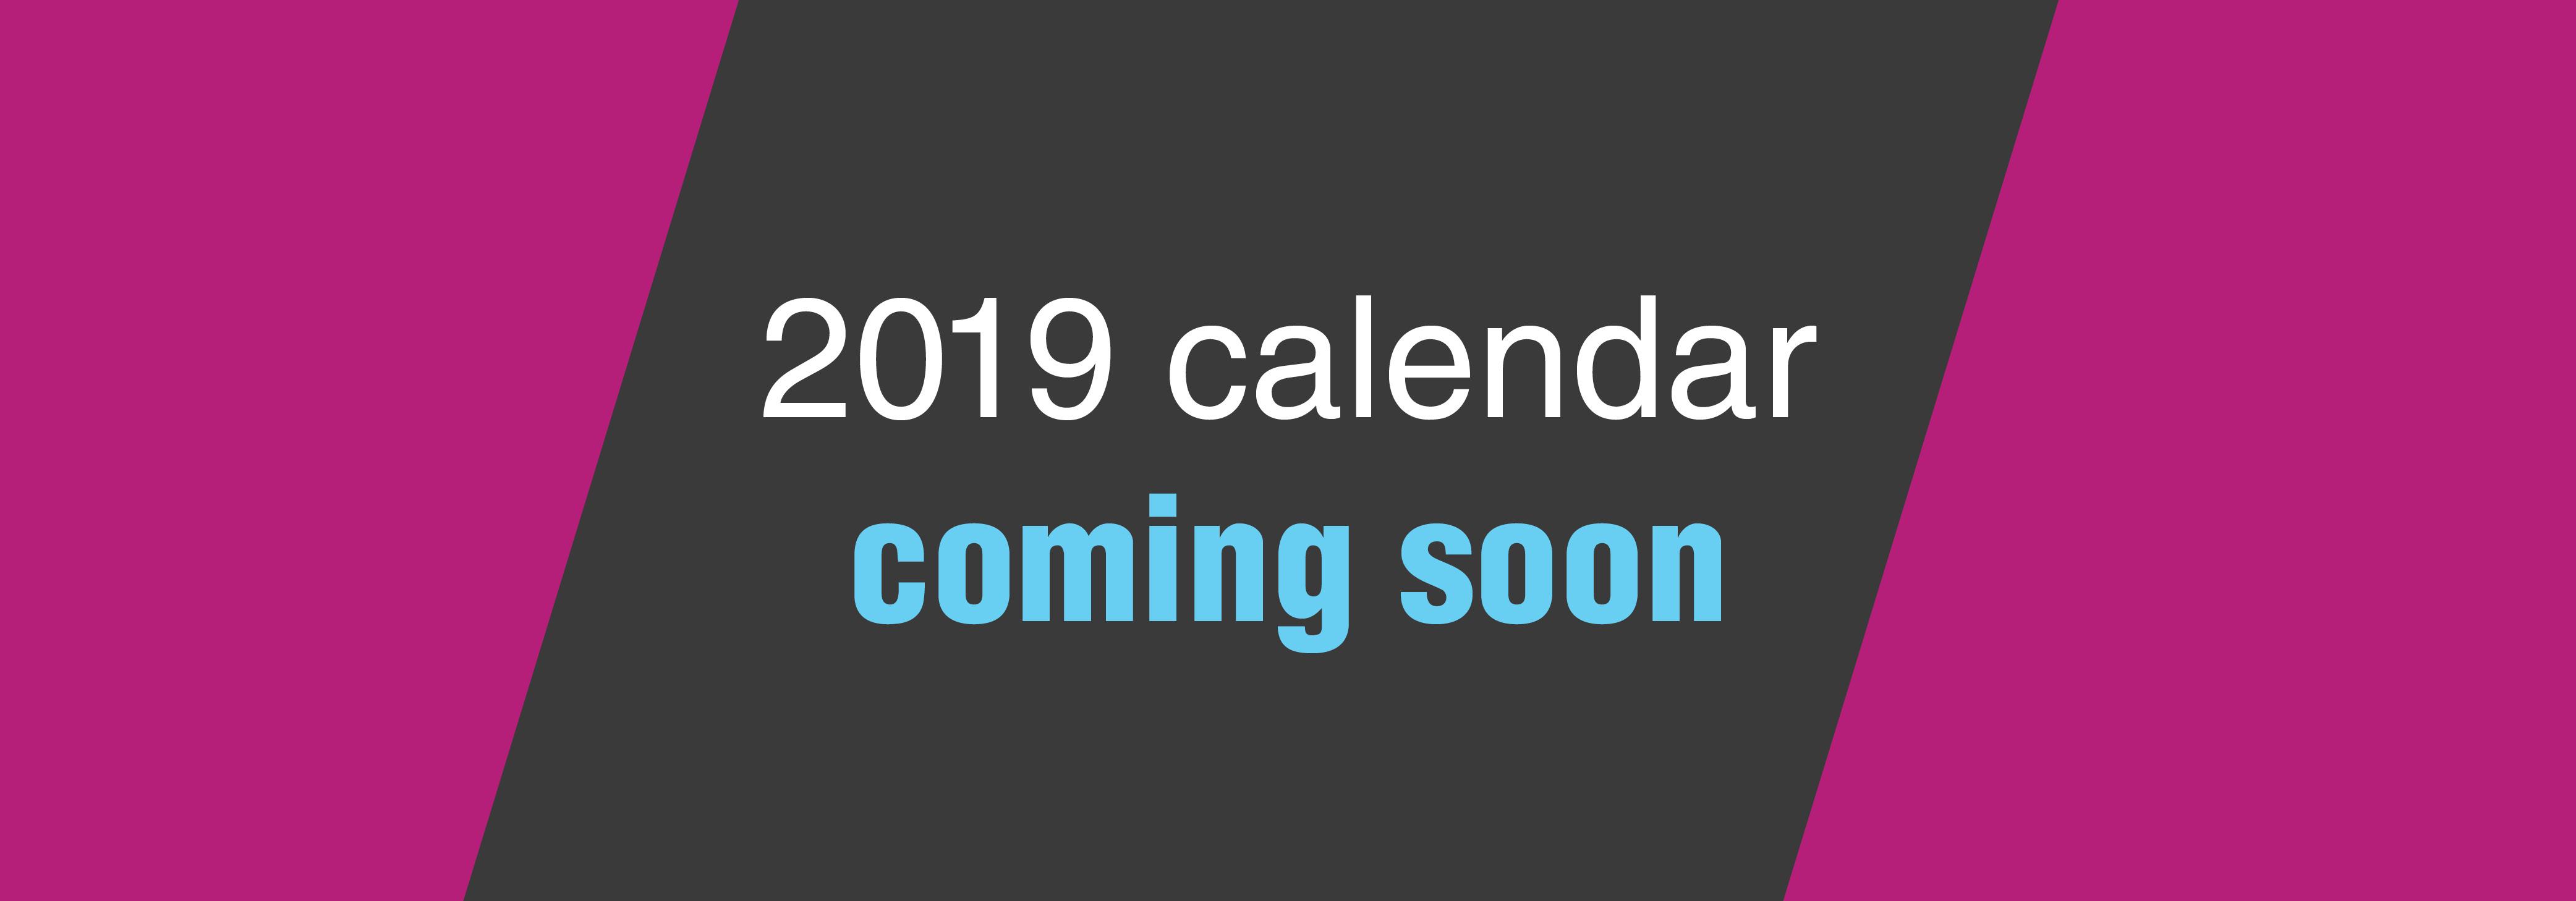 2019 calendar - coming soon